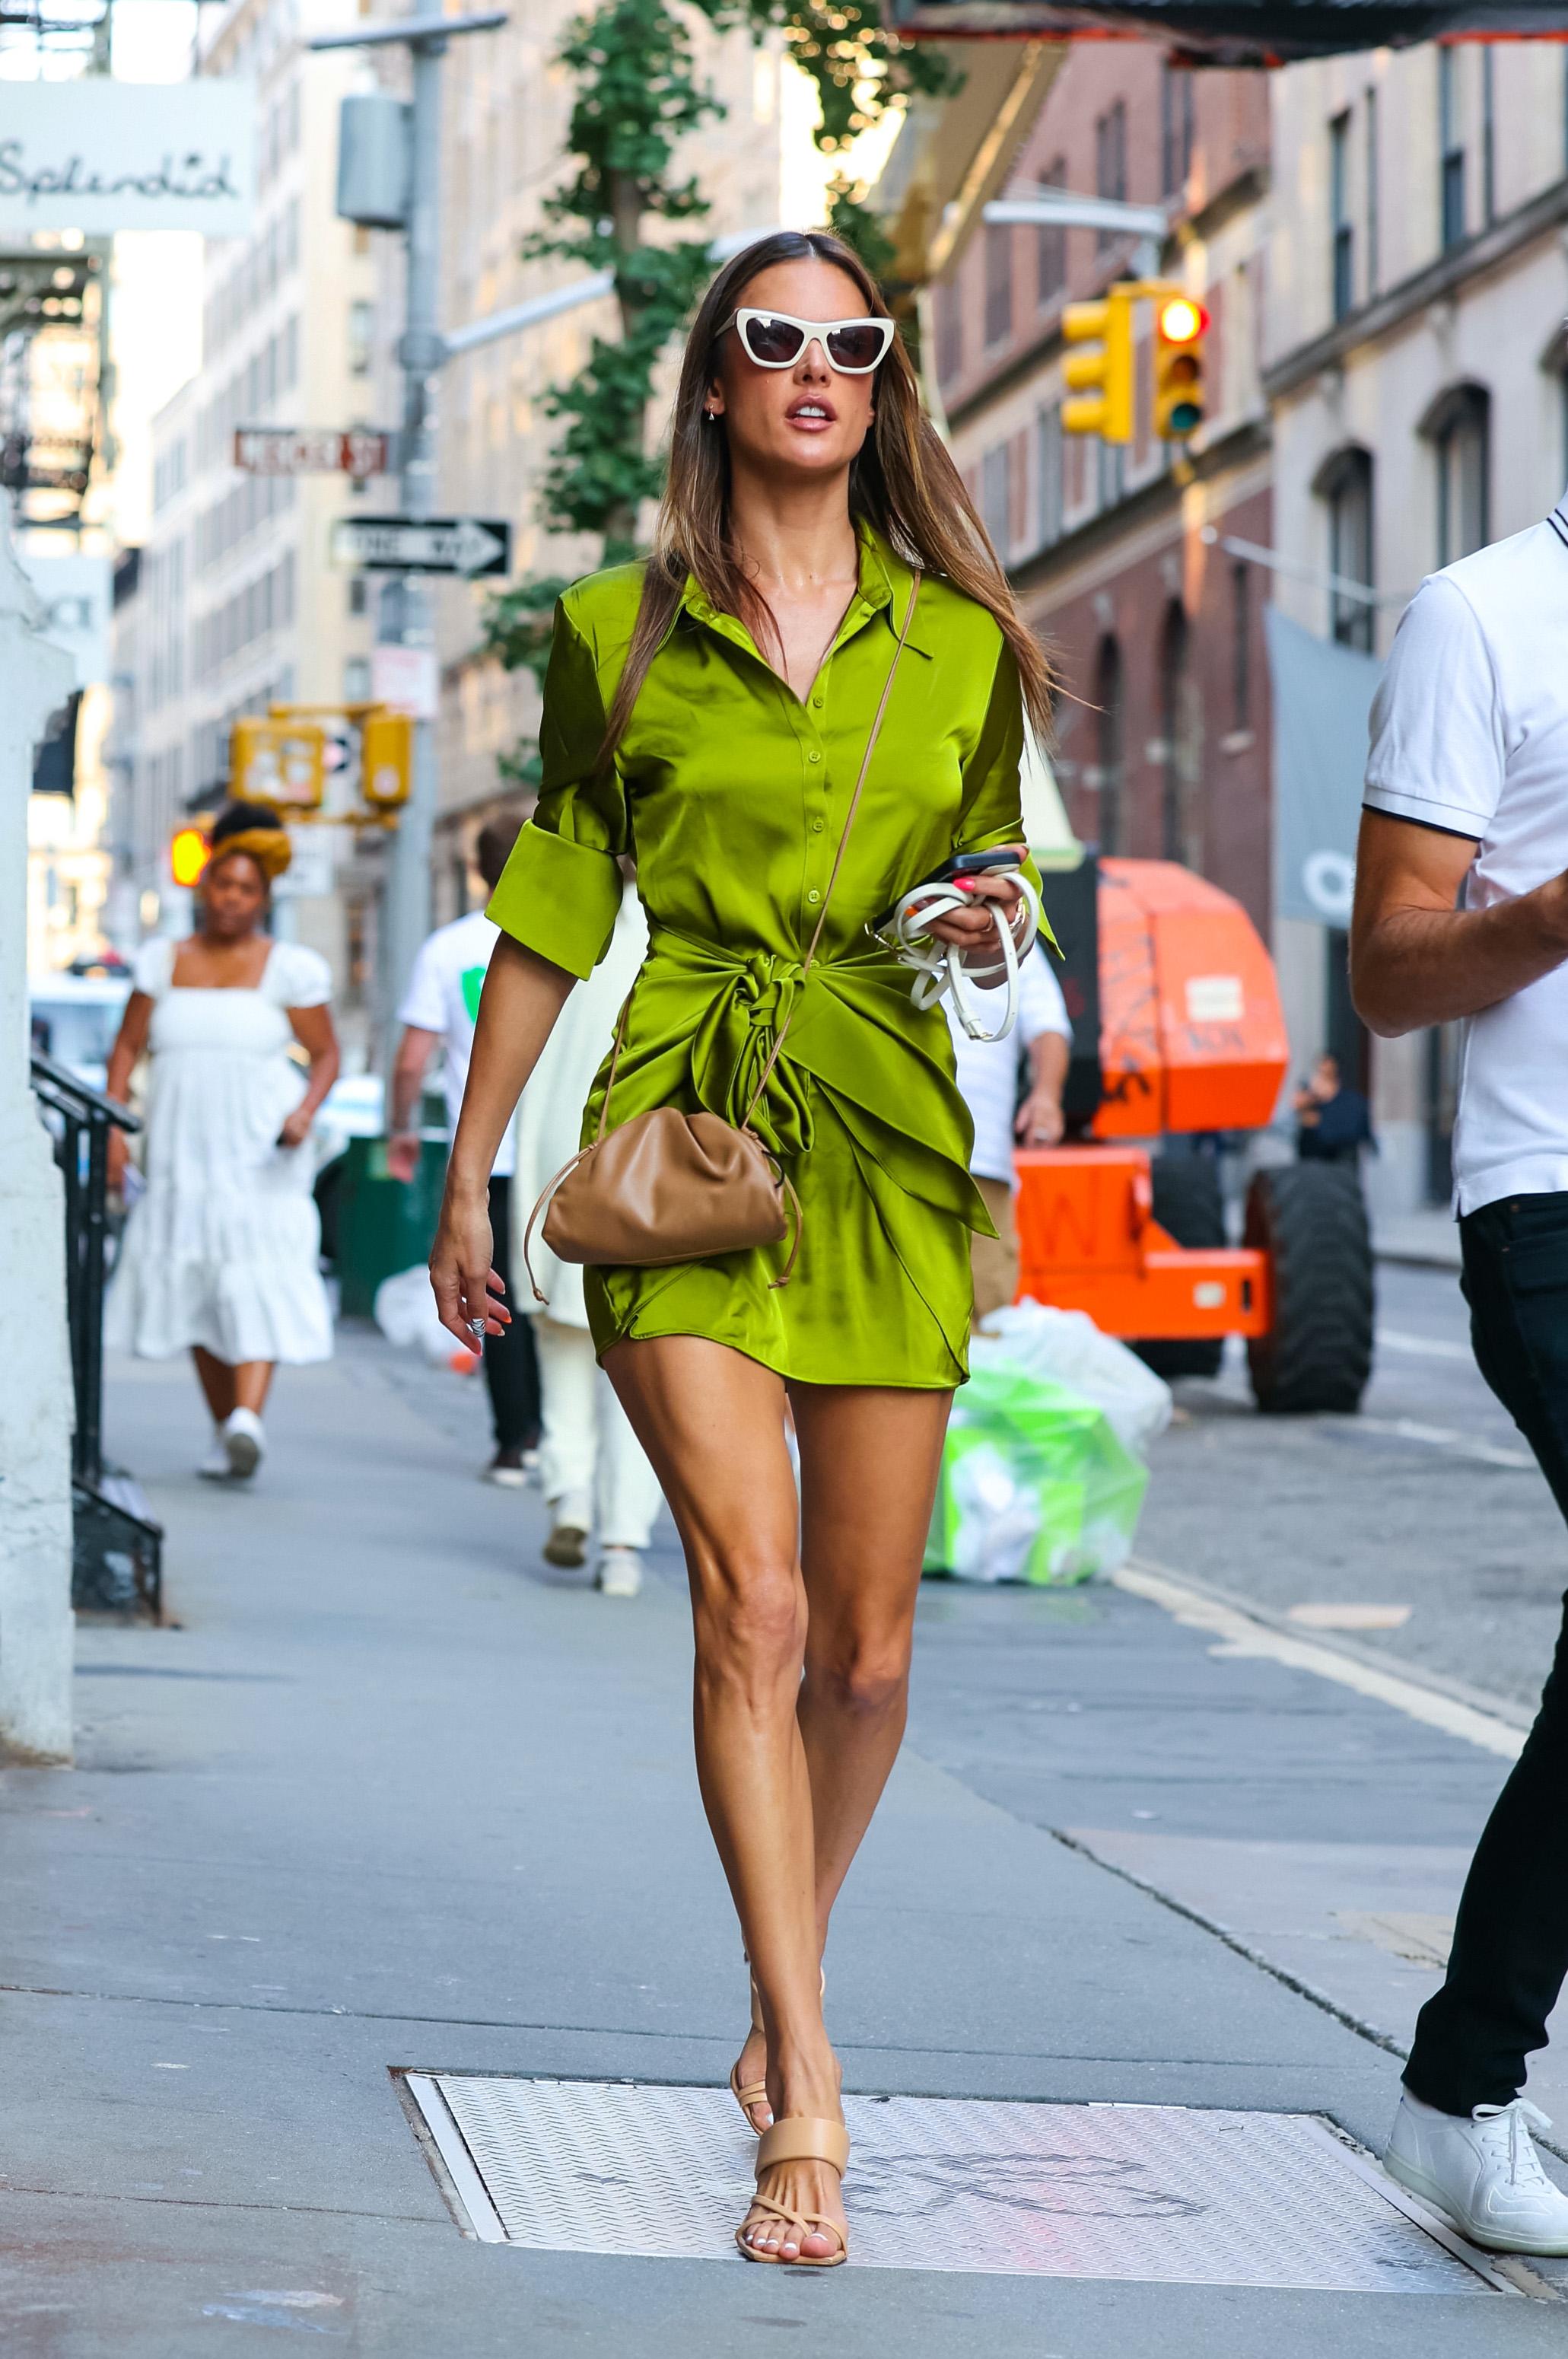 Alessandra Ambrosio is seen in New York City. NON-EXCLUSIVE September 8, 2021. 08 Sep 2021 Pictured: Alessandra Ambrosio. Photo credit: Jose Perez/Bauergriffin.com / MEGA TheMegaAgency.com +1 888 505 6342 (Mega Agency TagID: MEGA785366_009.jpg) [Photo via Mega Agency]